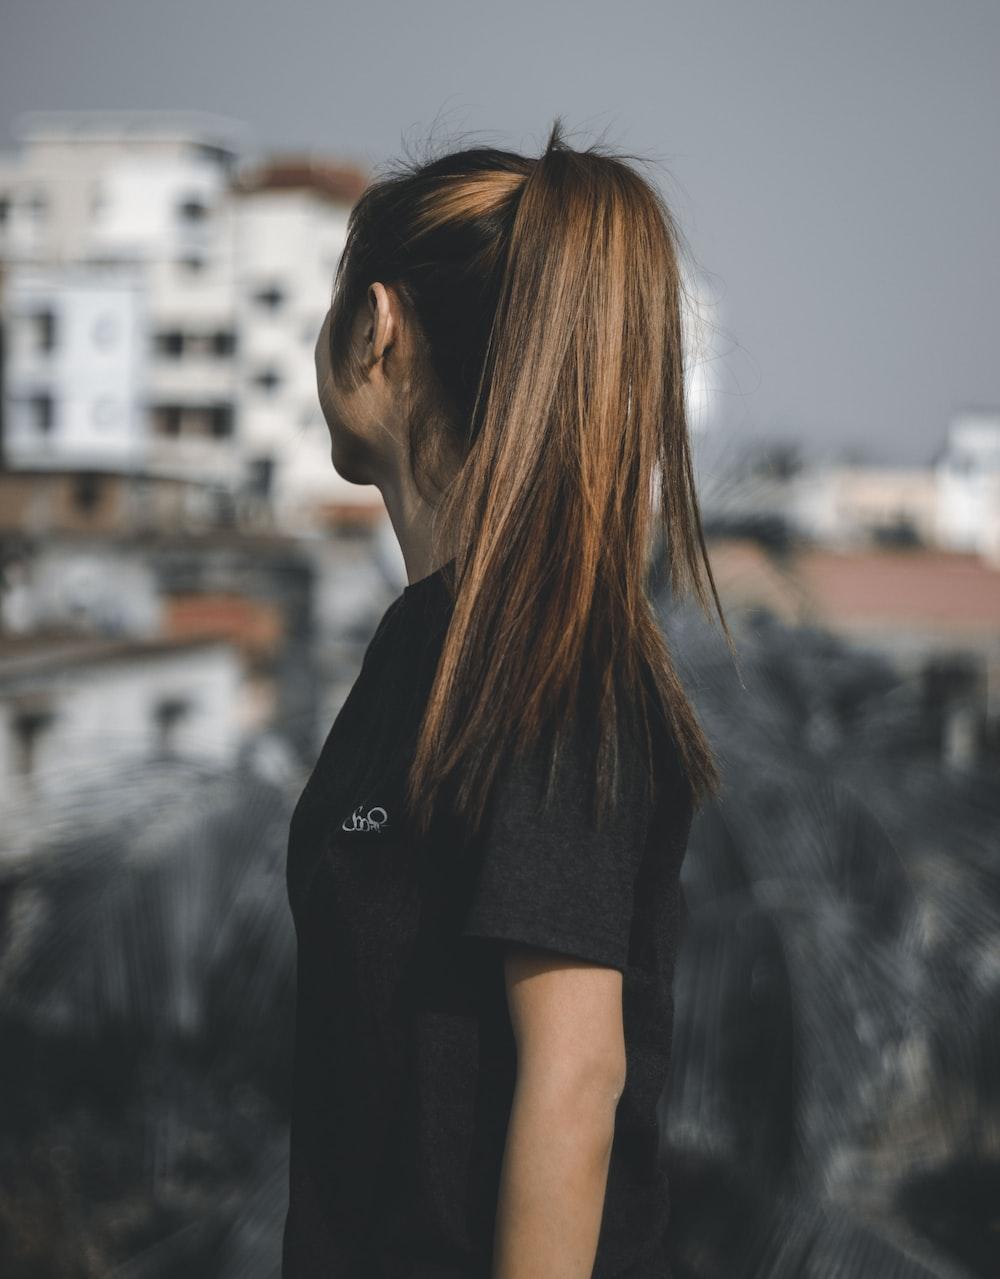 woman looking sideward during daytime